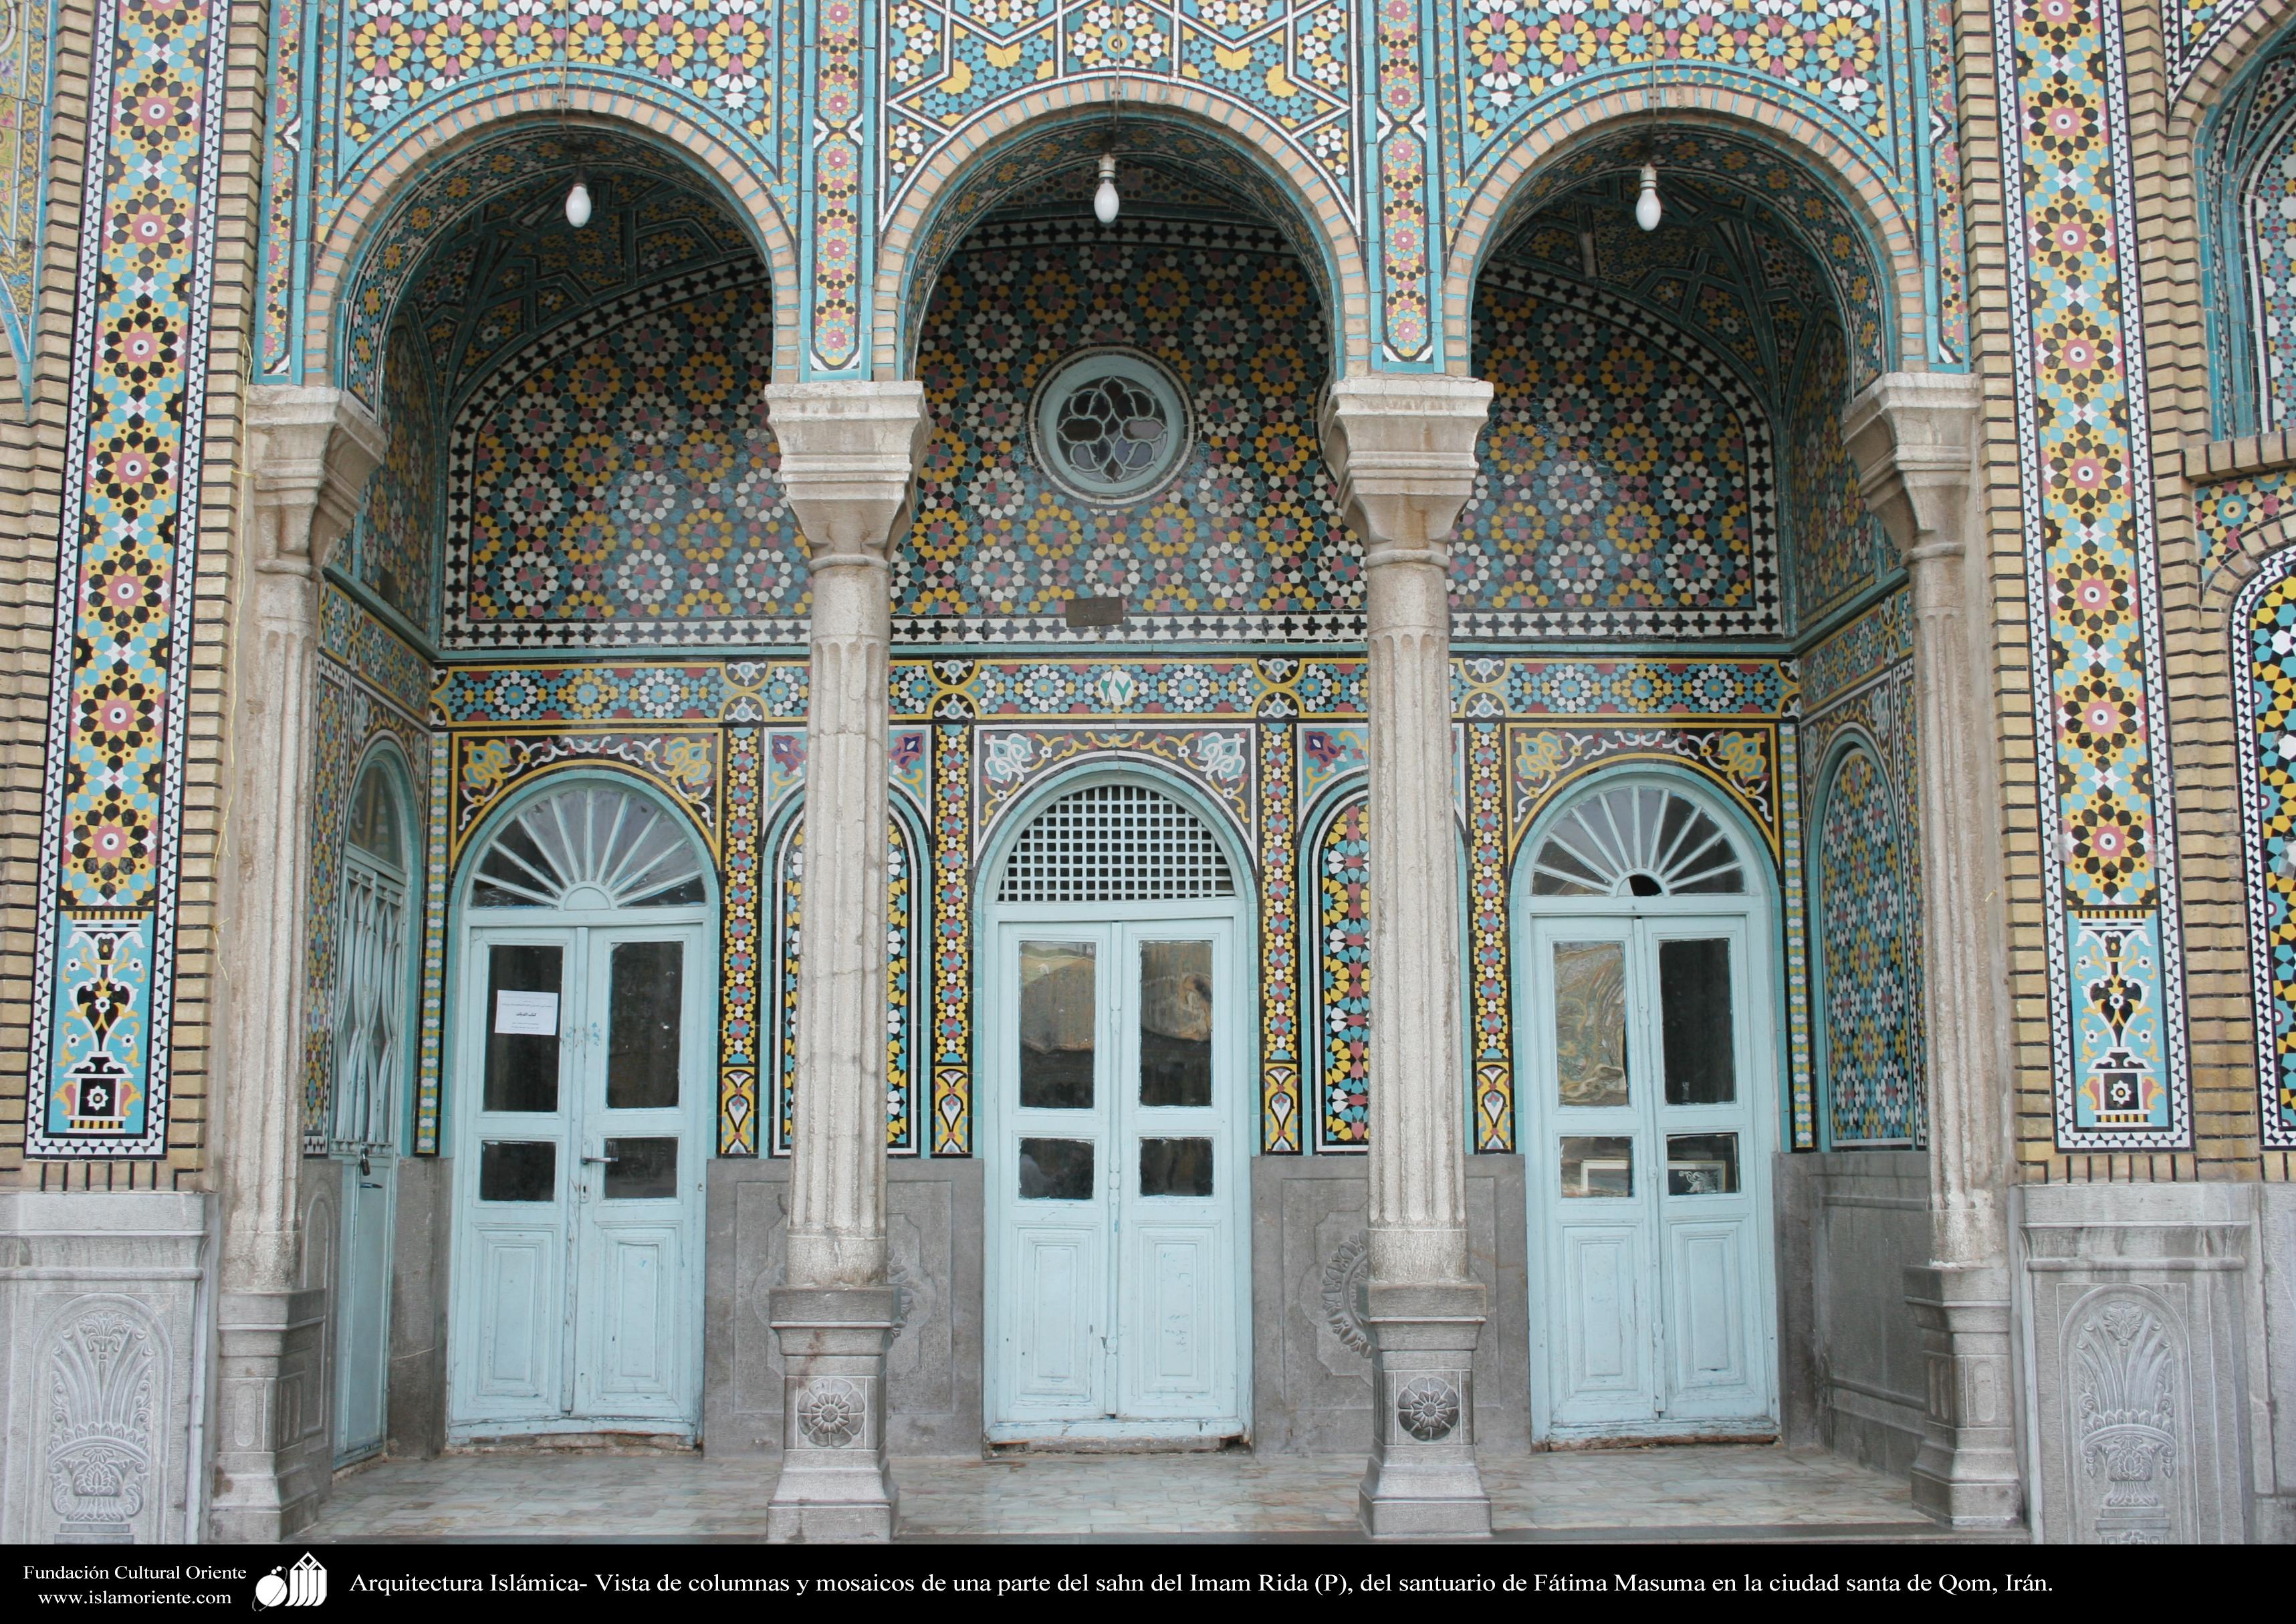 Arquitectura isl mica vista de columnas y mosaicos de una for Arquitectura islamica